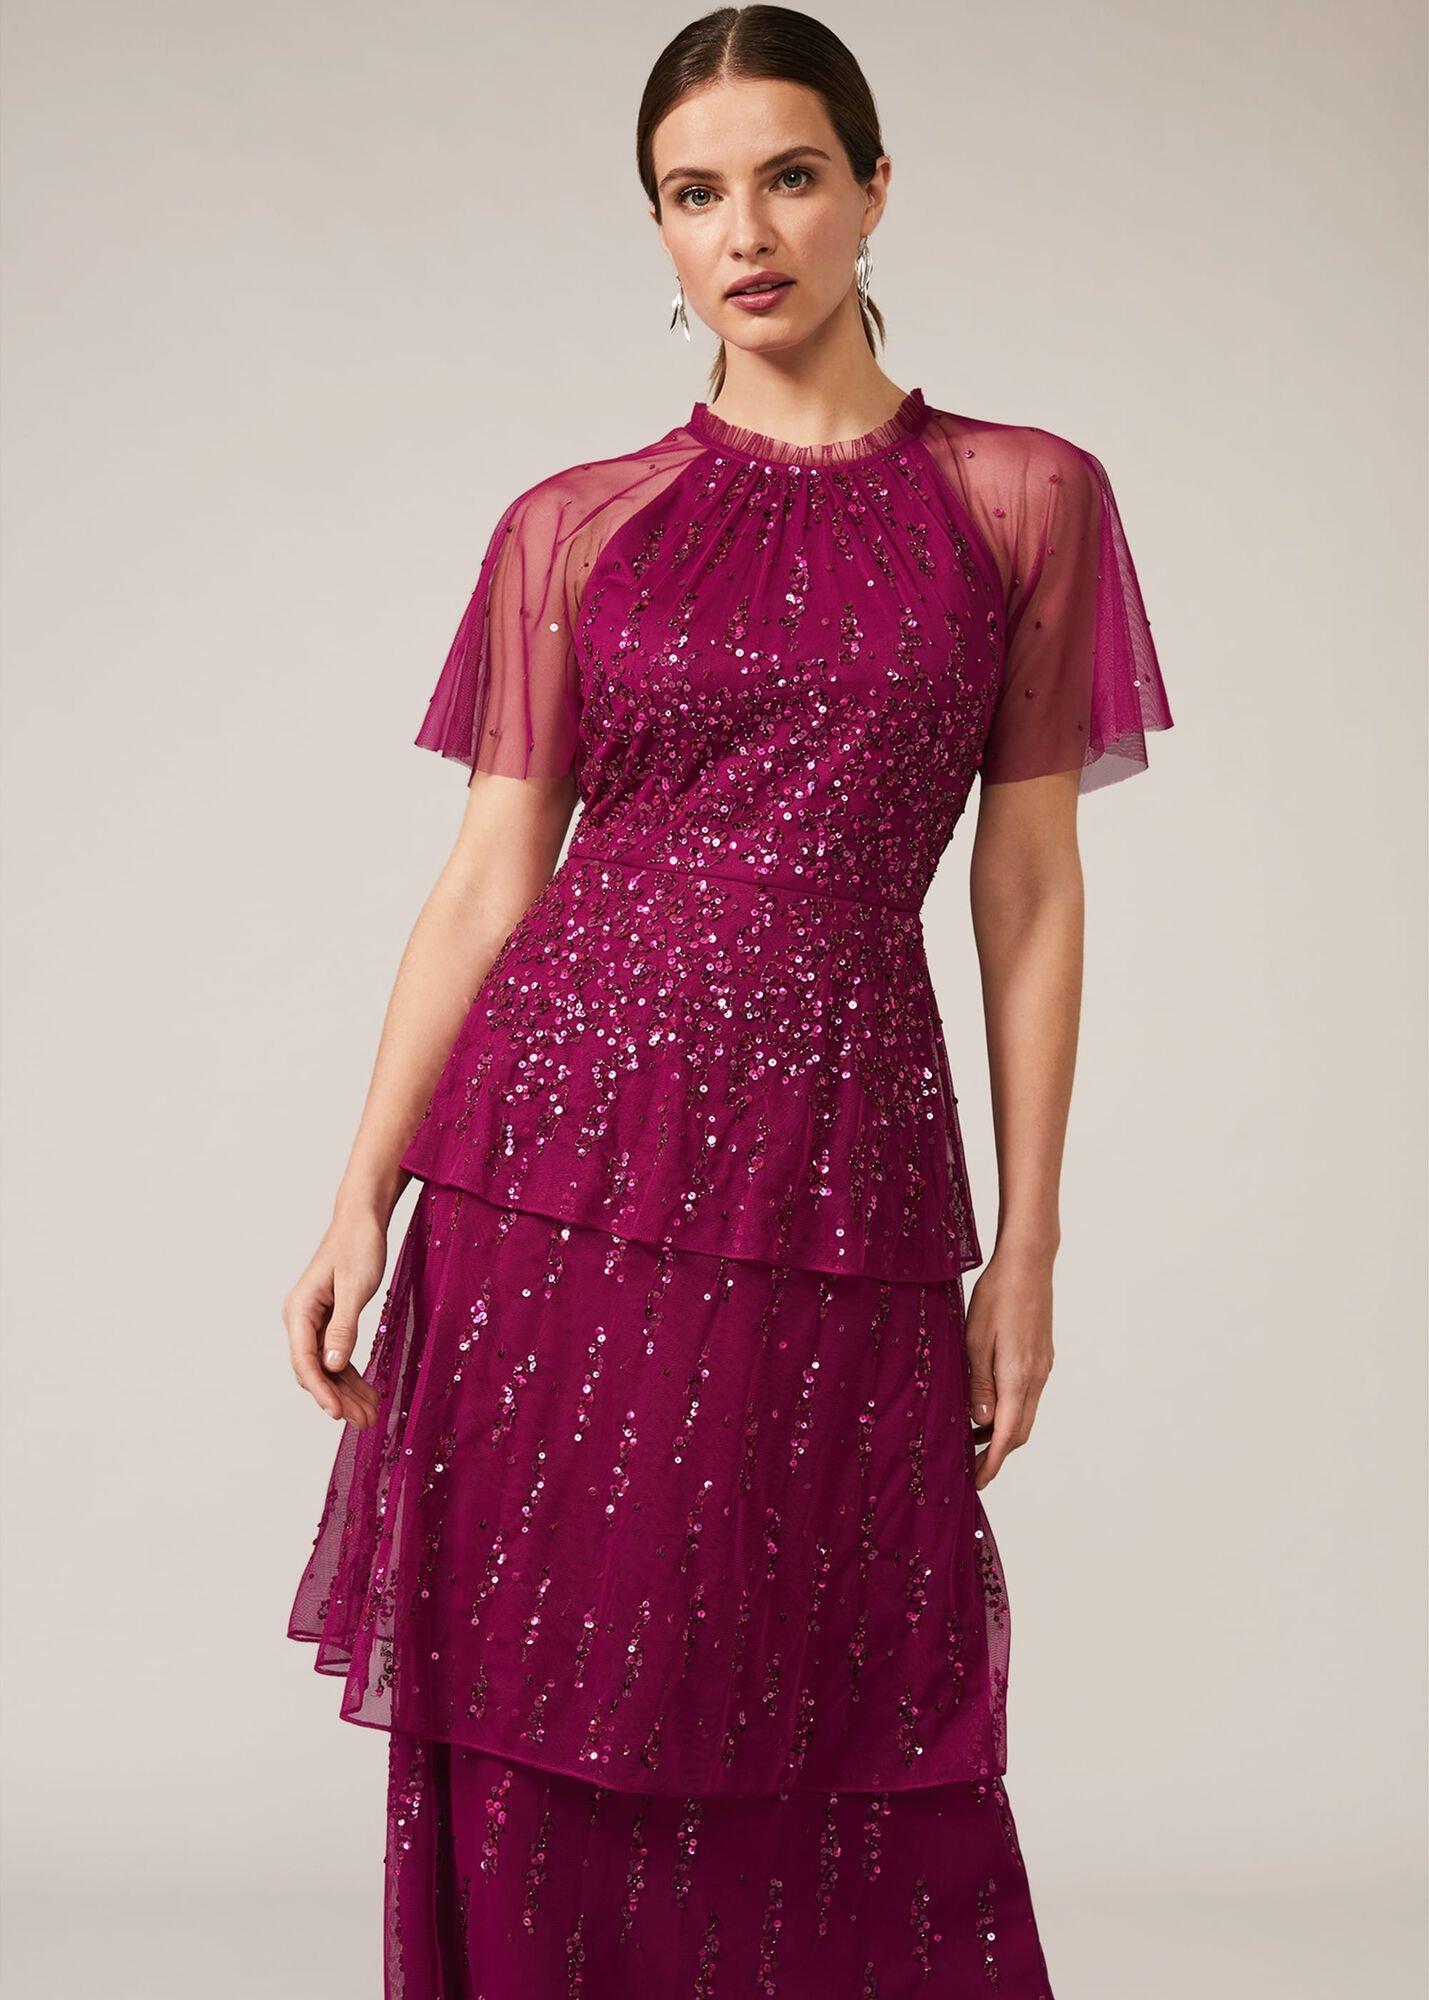 209427720-03-liliana-tiered-embellished-dress.jpg?sw=1429&sh=2000&strip=false